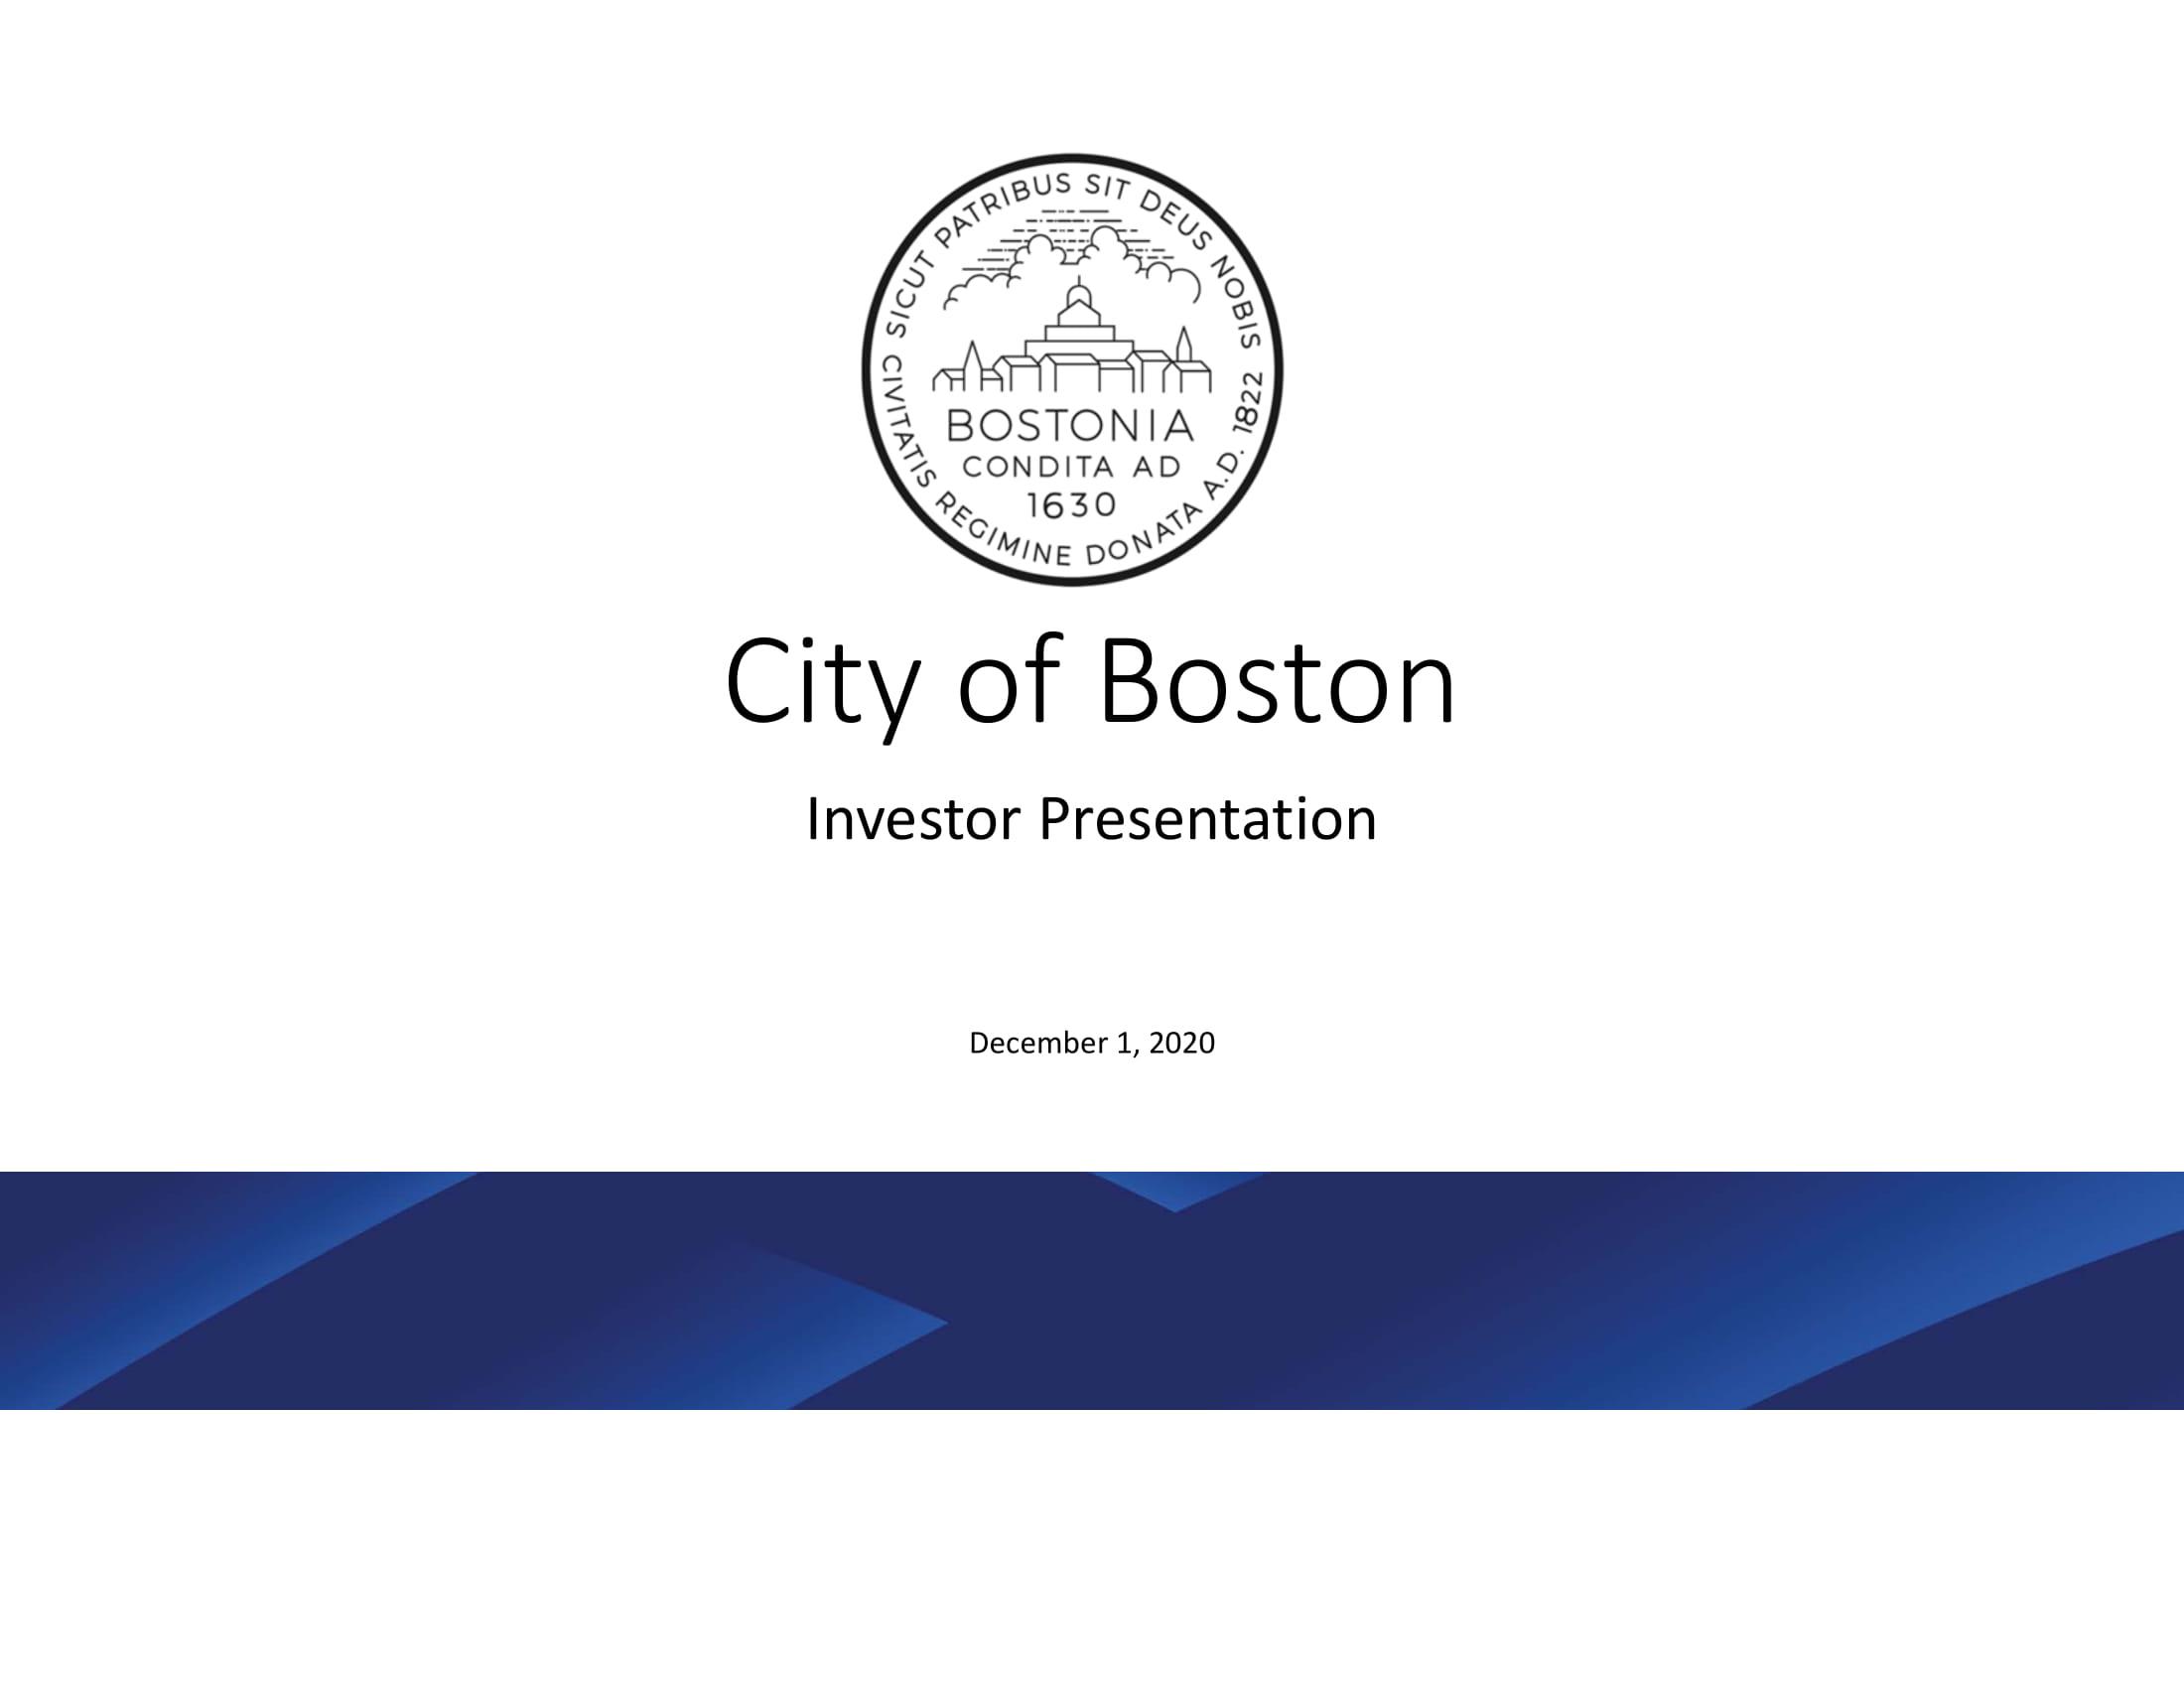 City of Boston Investor Presentation